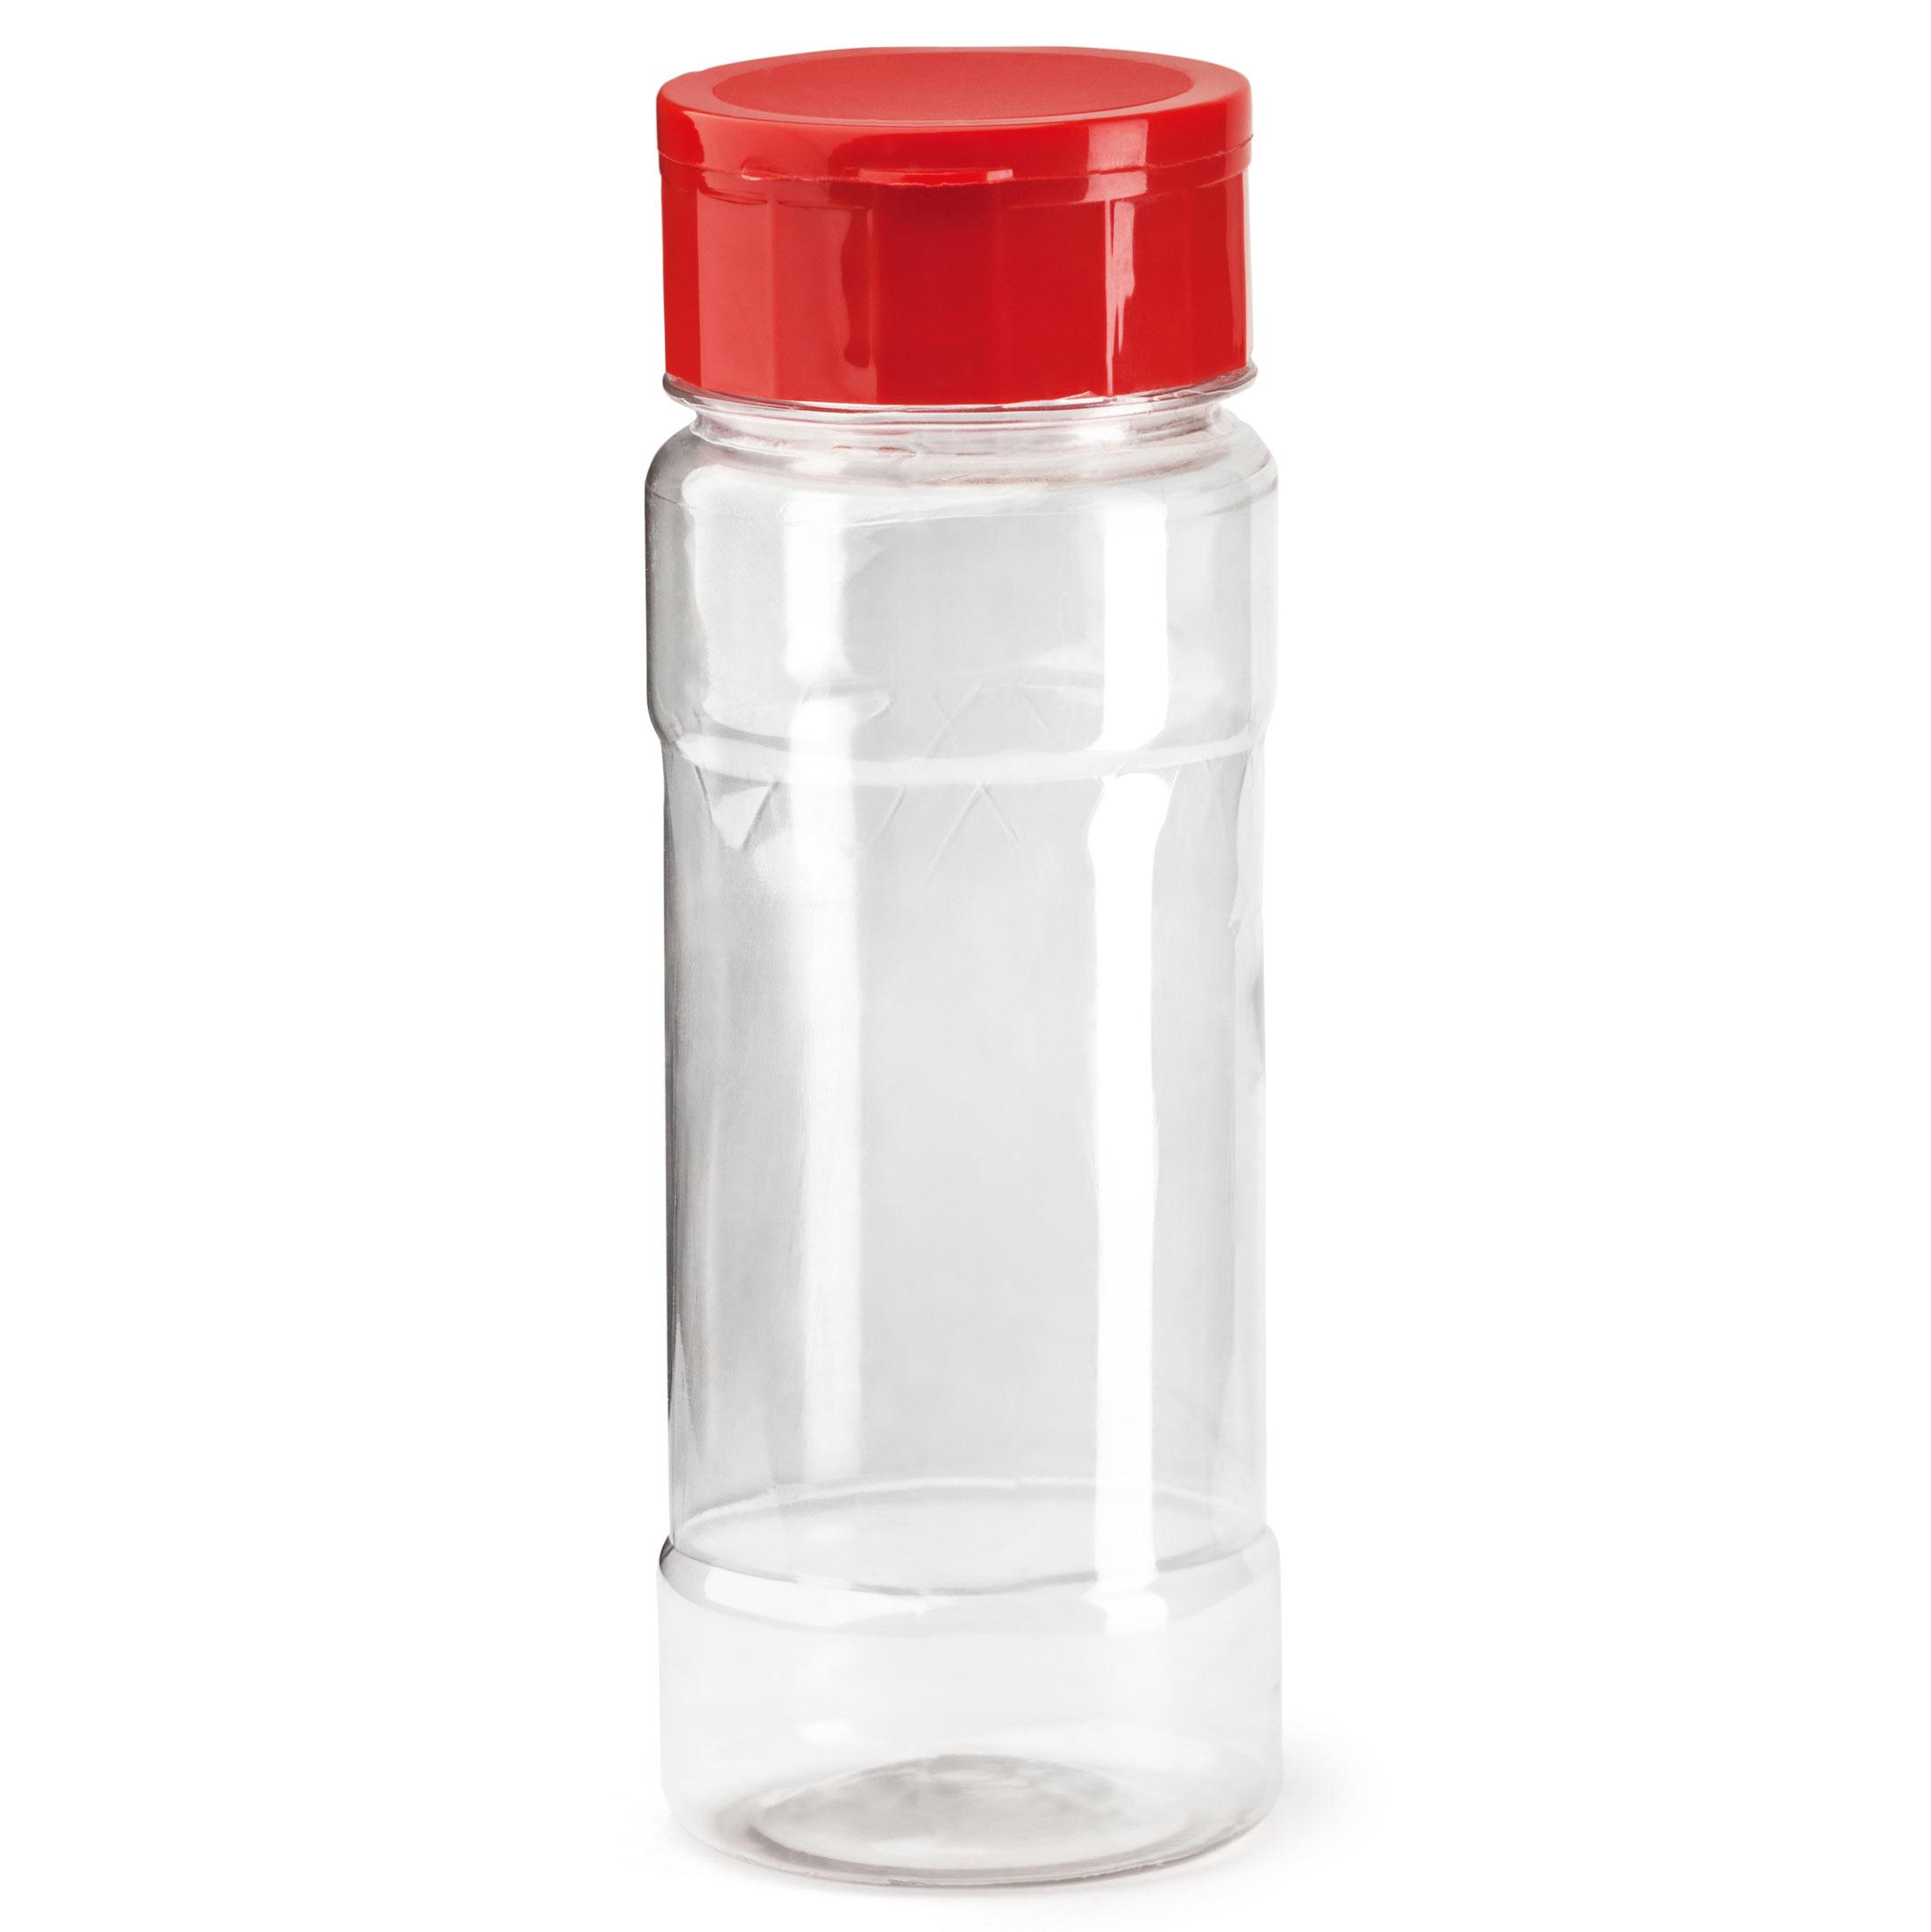 spice plastic shaker